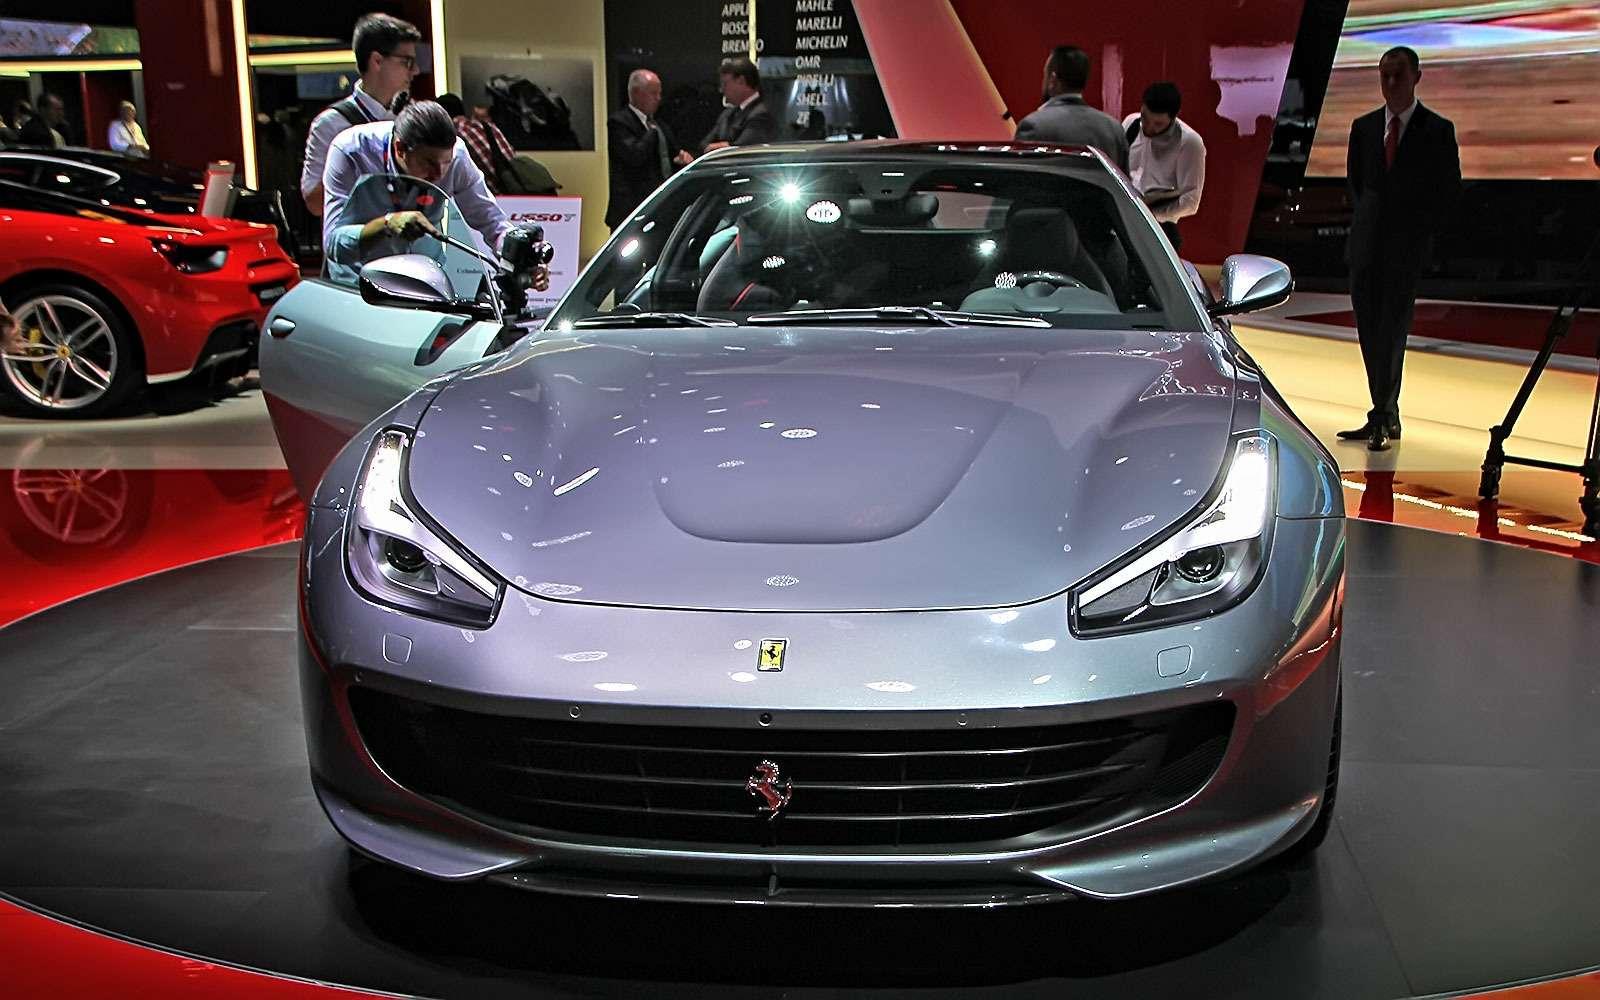 Махнул неглядя: Ferrari GTC4Lusso Tпоменял полный привод натурбонаддув— фото 641672